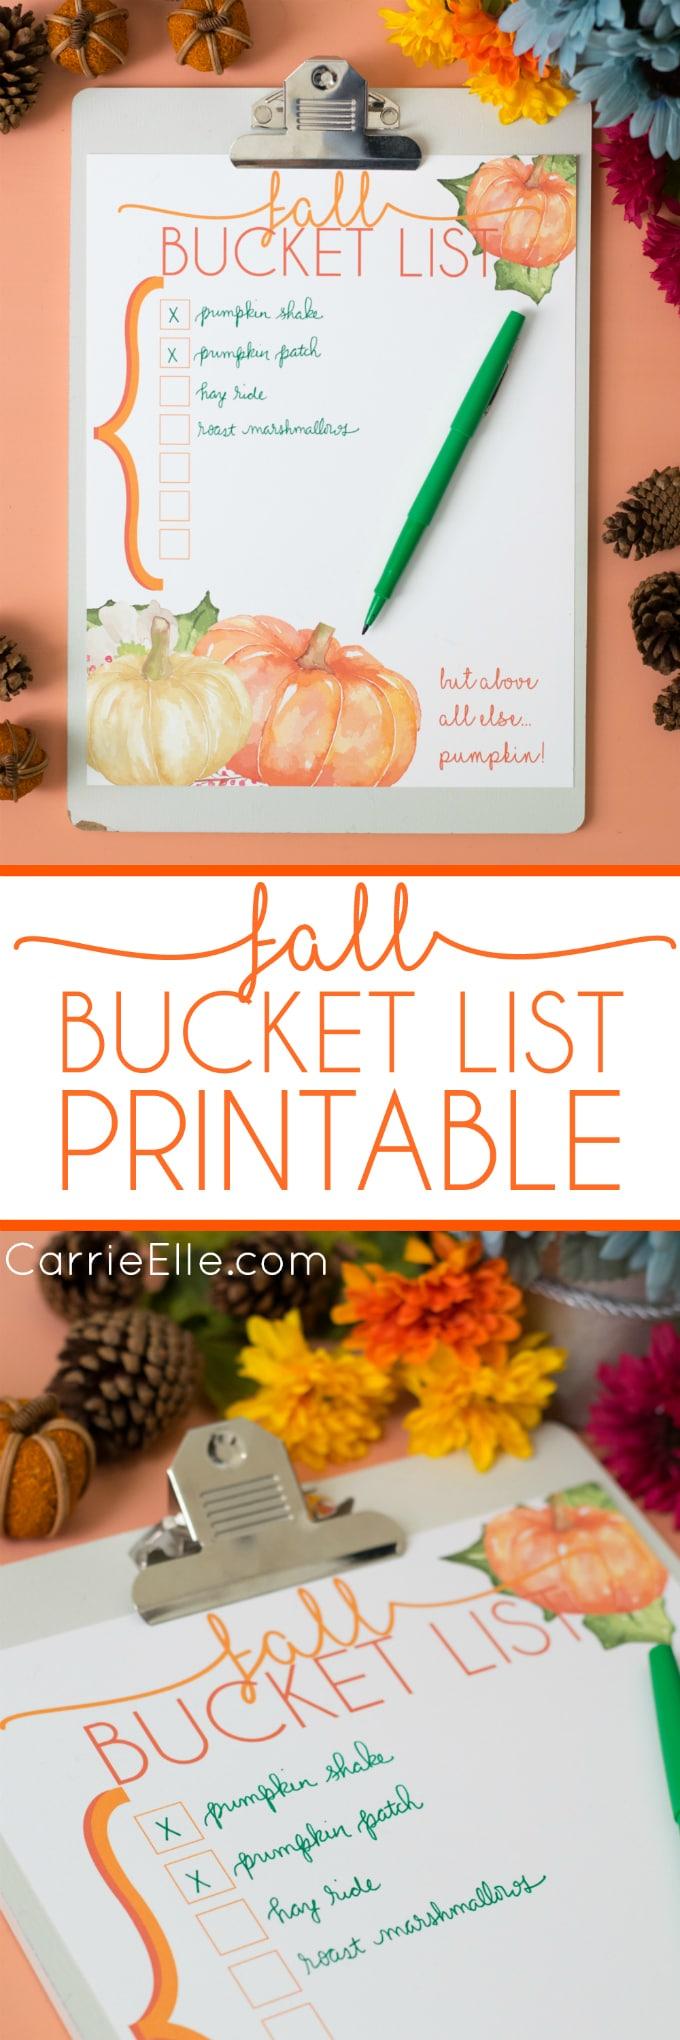 Fall Bucket List Printable Carrie Elle